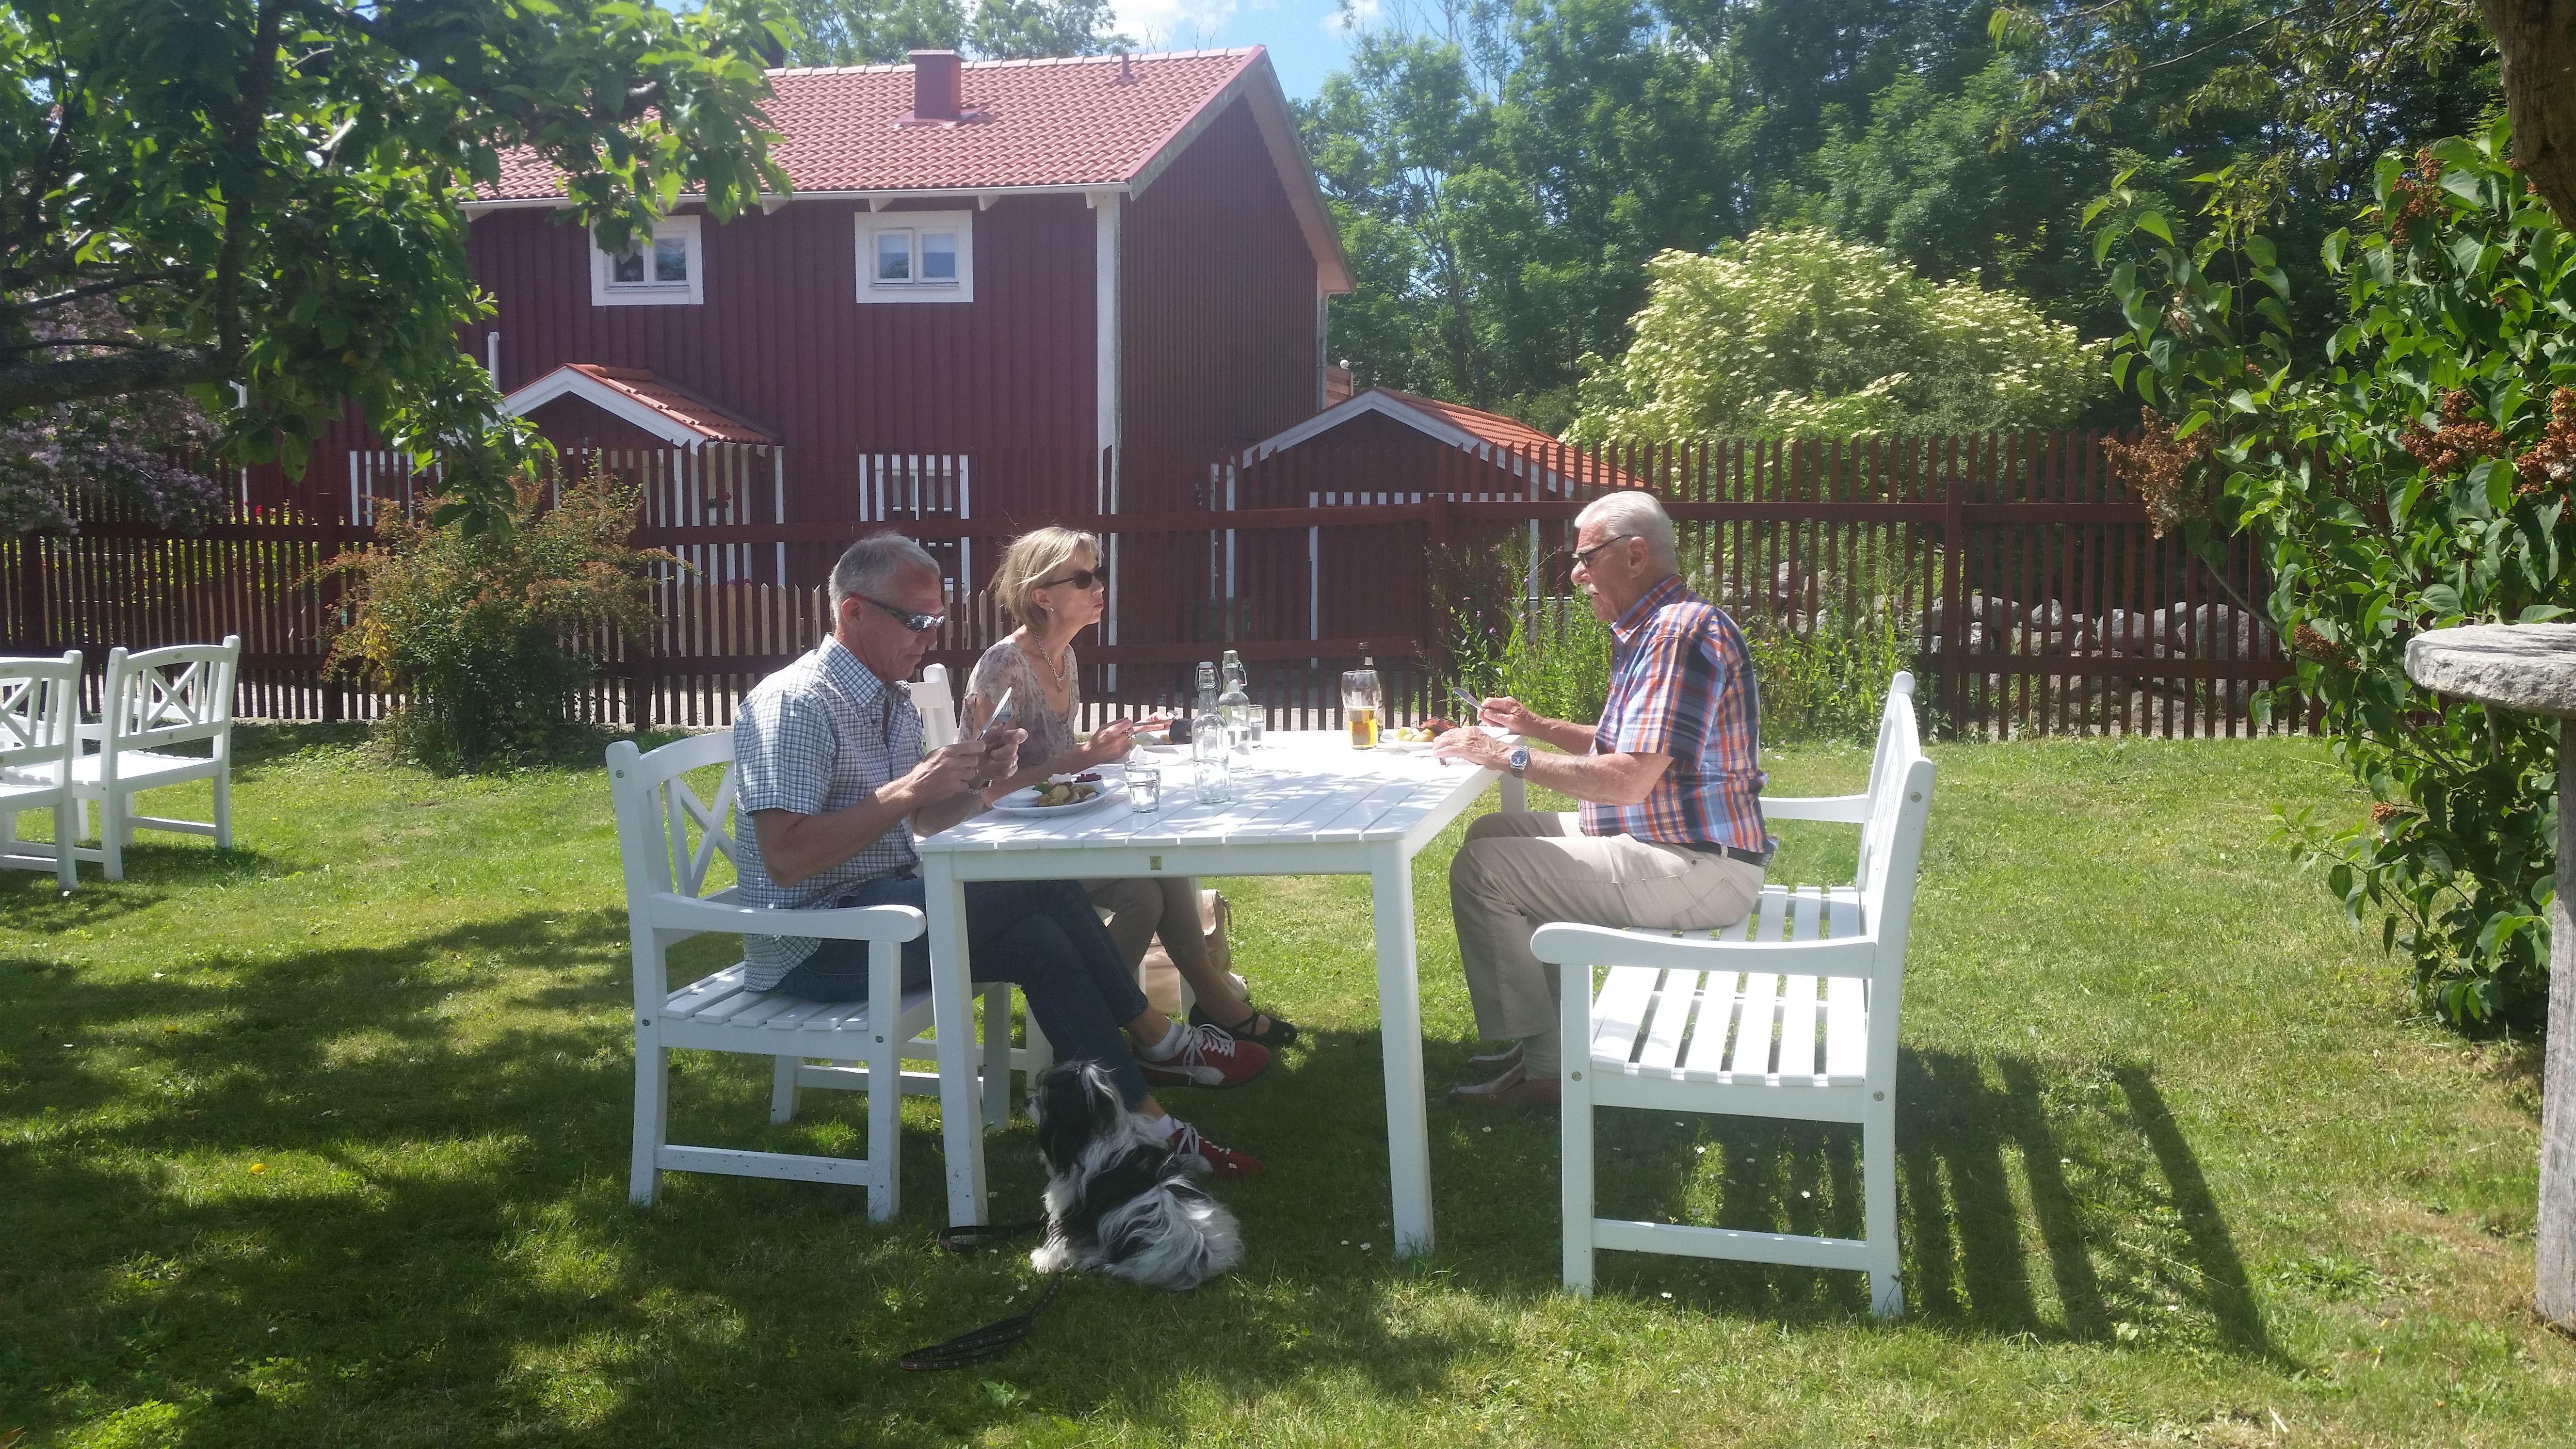 Kristianopel's Gästgiveri B&B